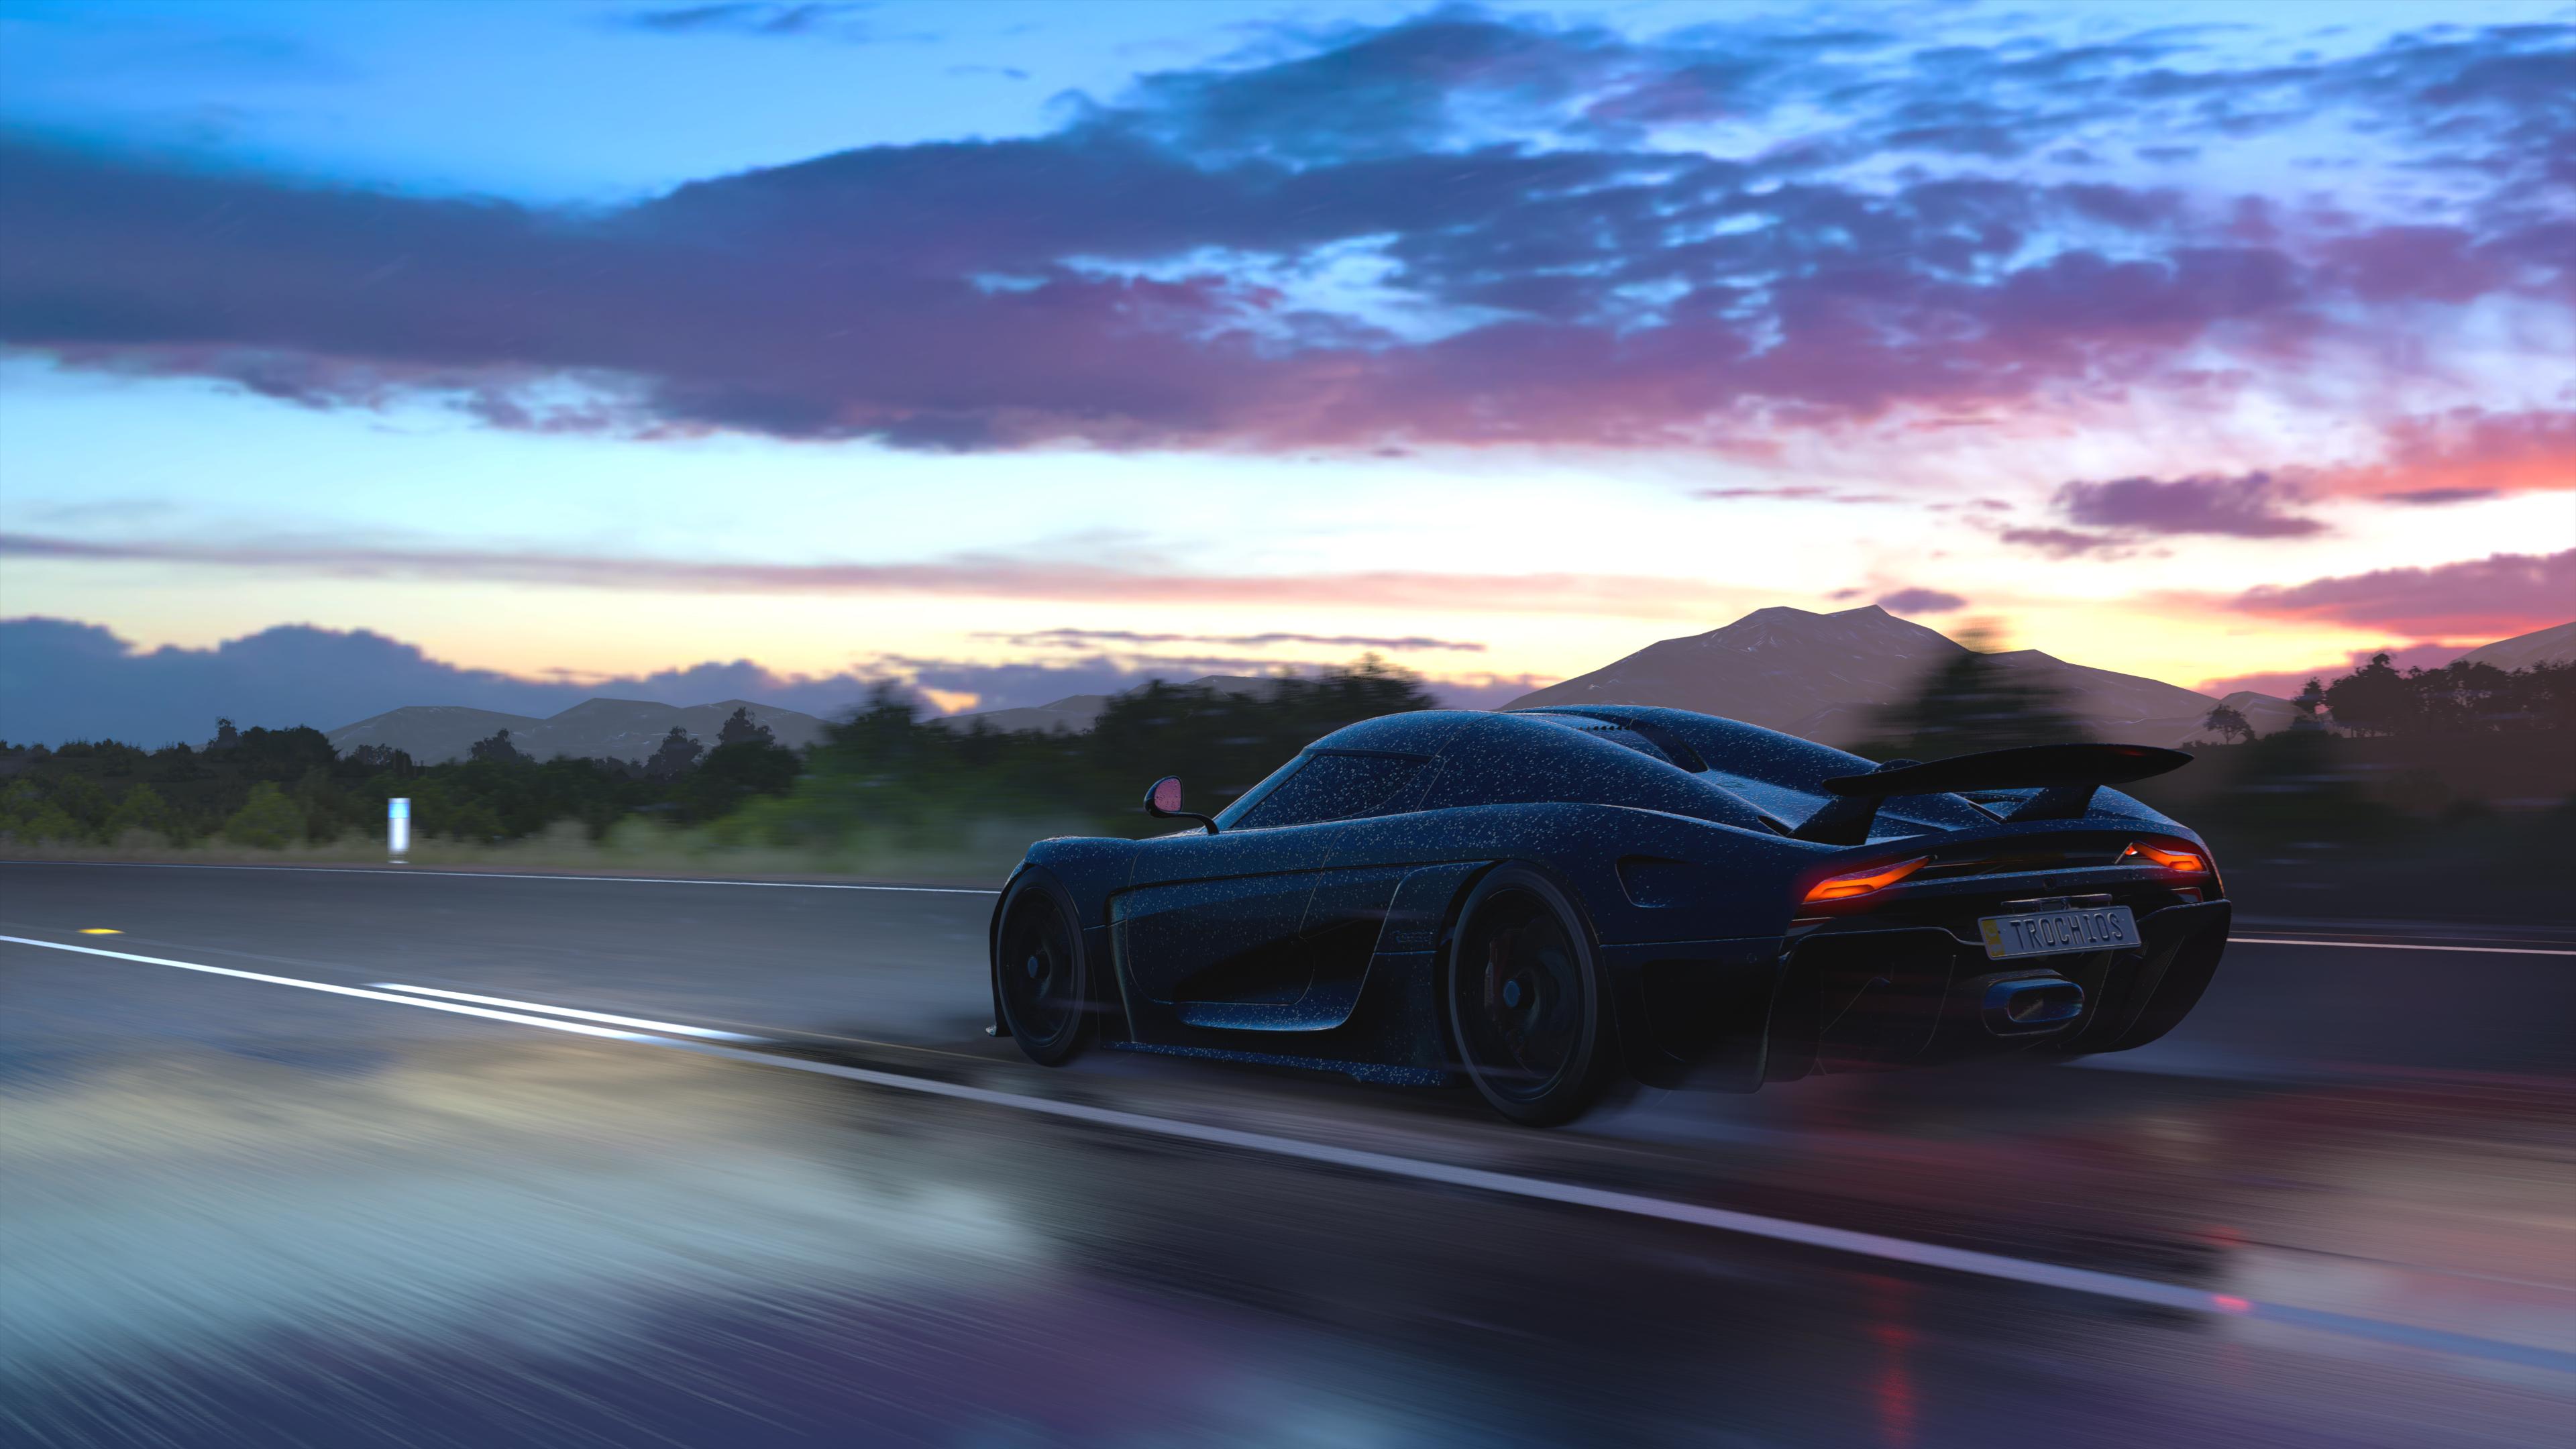 Forza Horizon 3 Koenigsegg Regera 4k, HD Games, 4k